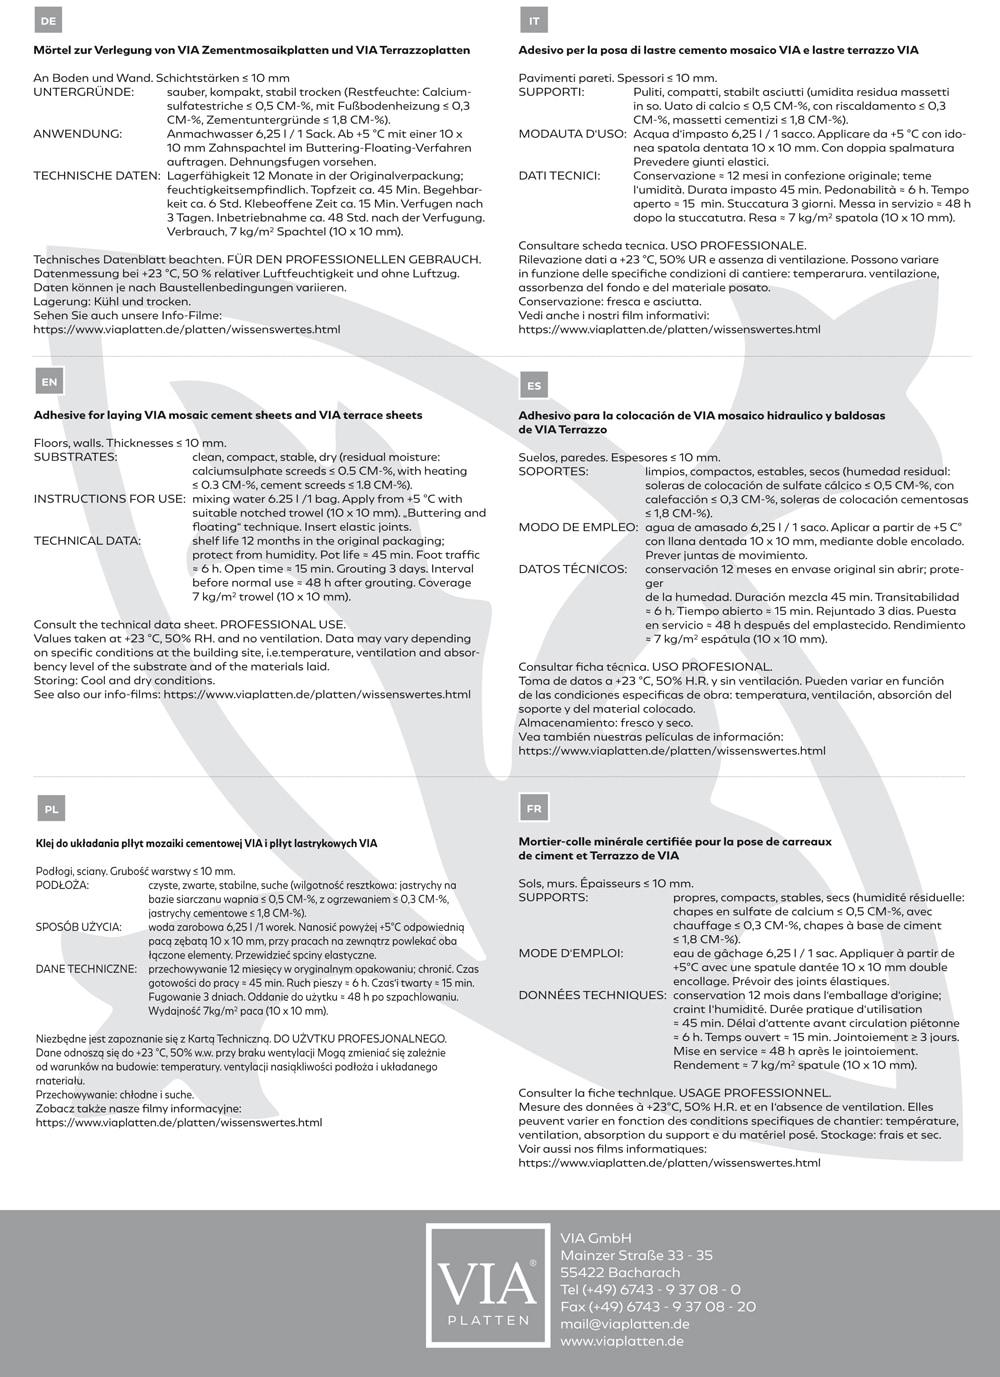 klebersack-rueckseite-via-gmbh_1 | VIA Plattenkleber